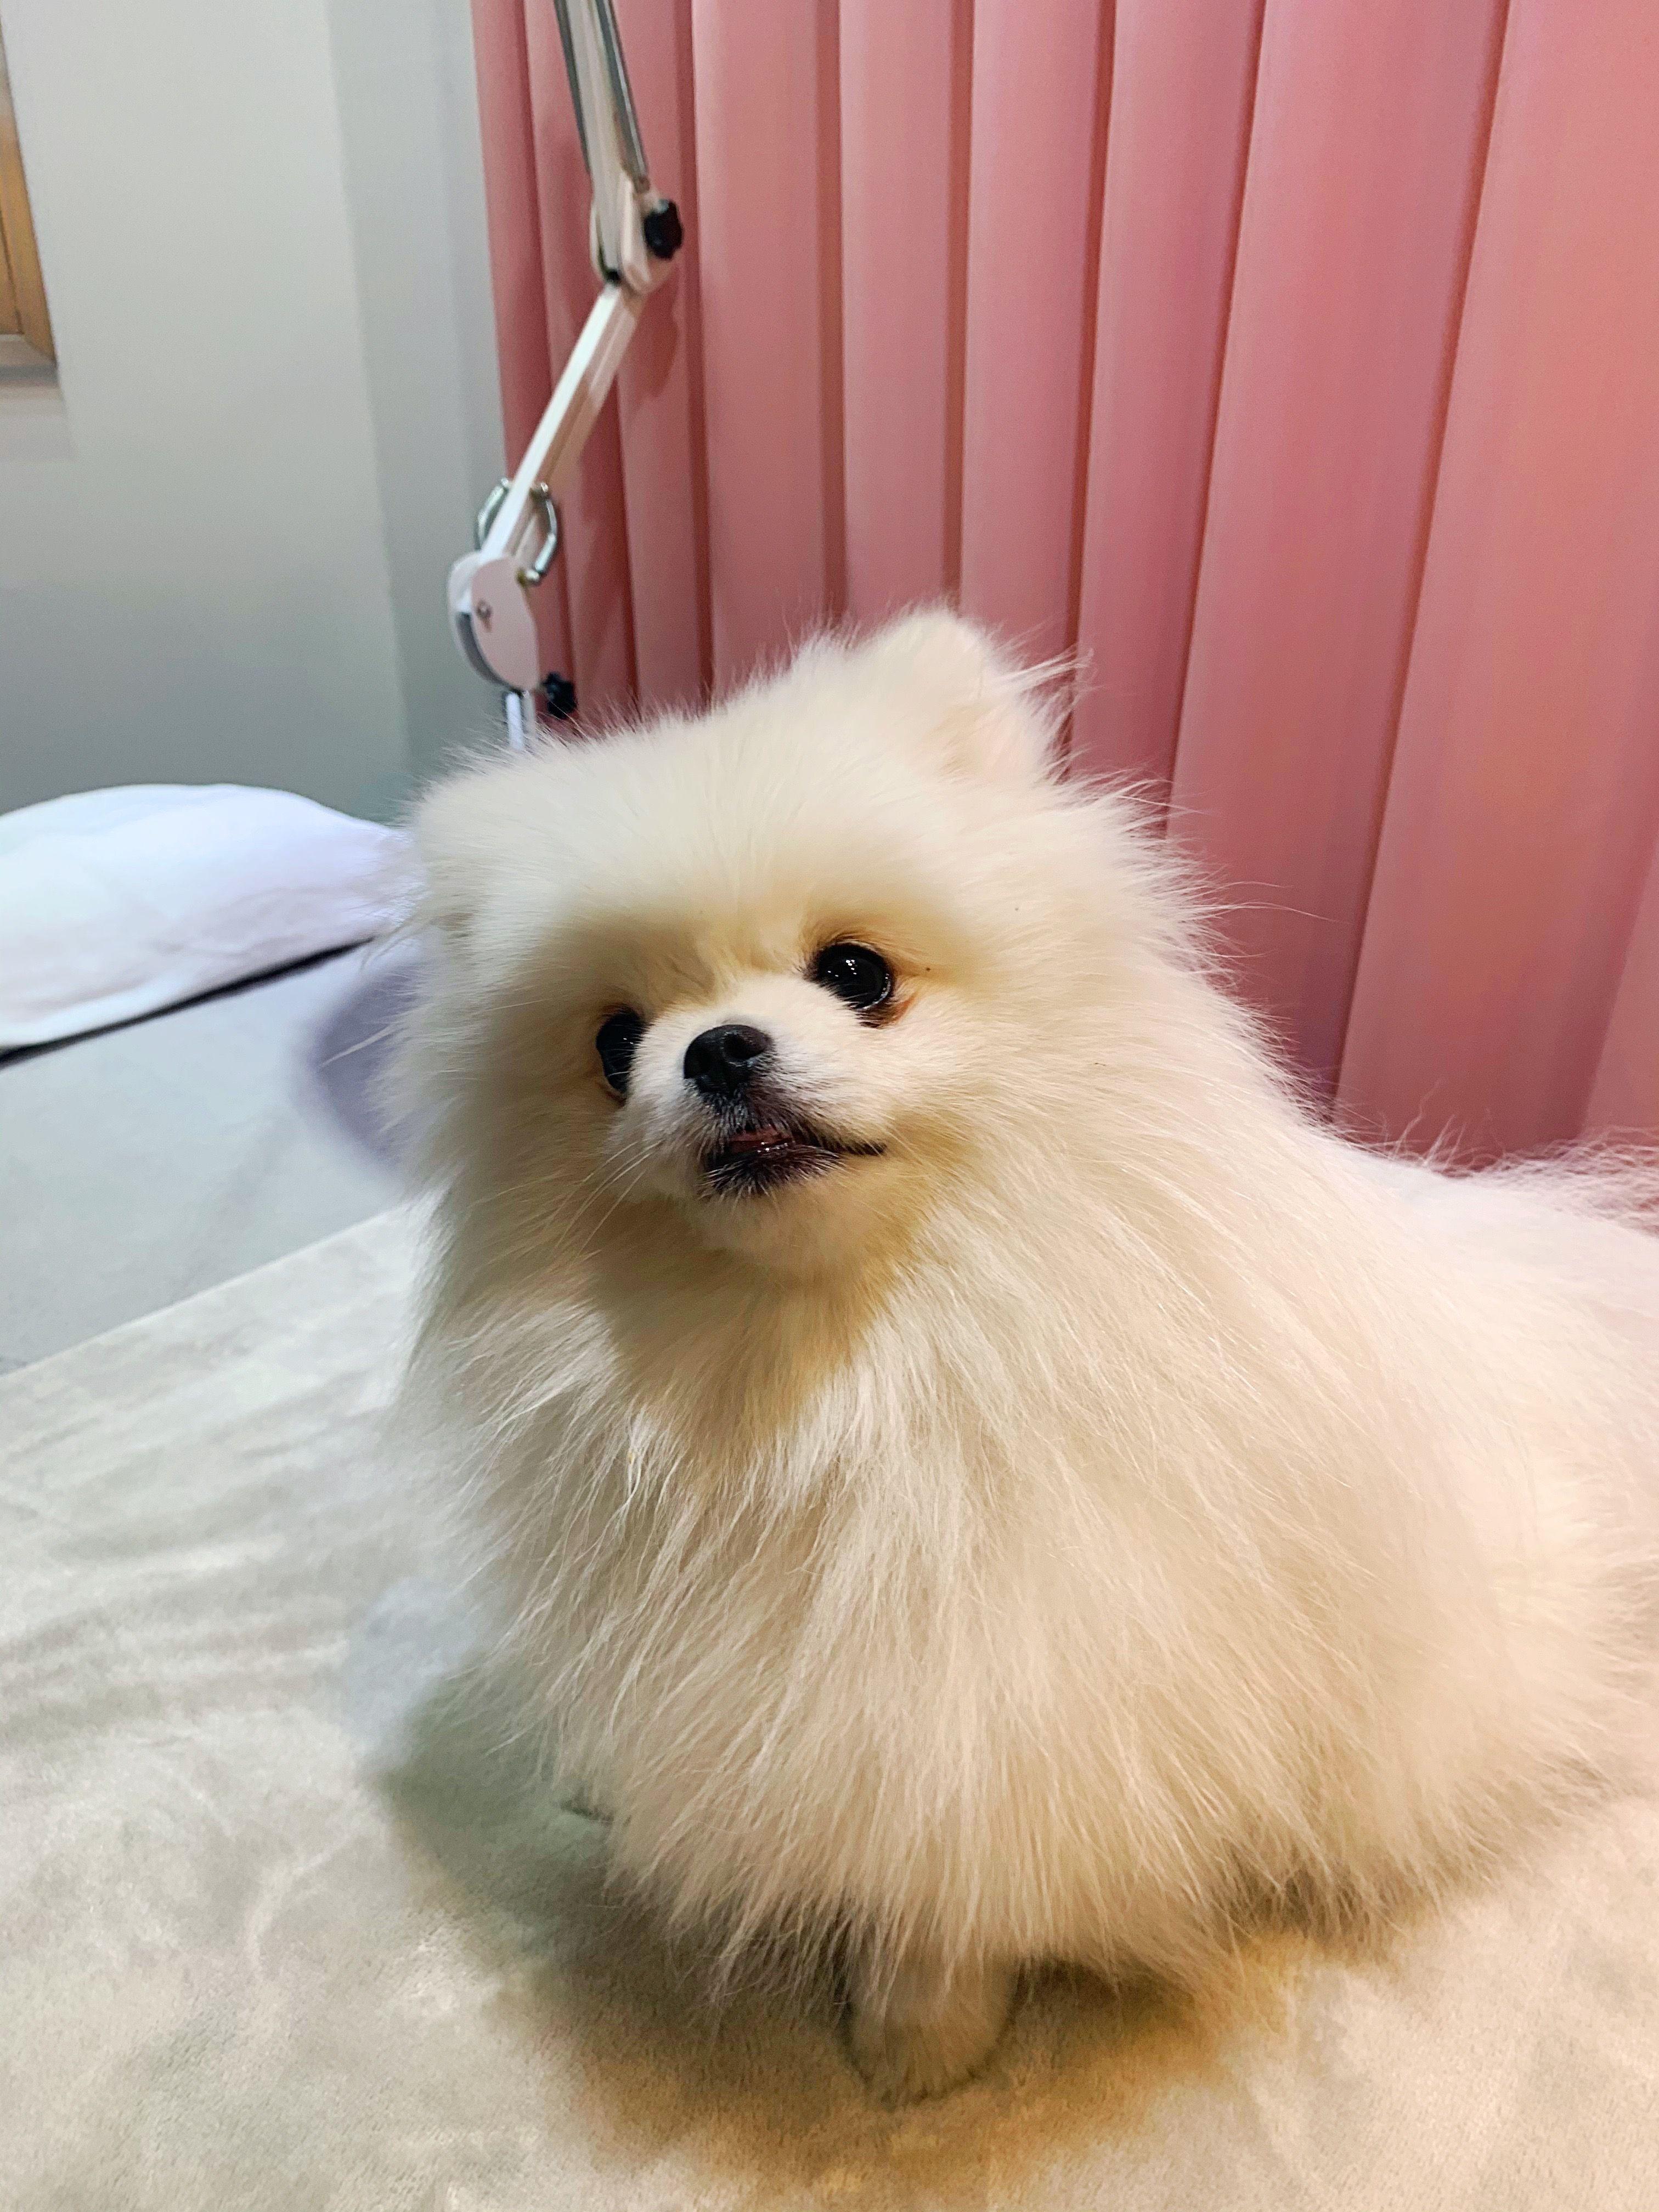 Gorgeous Pomeranian Puppy Girl  #teacuppomeranianpuppy Teacup Pomeranian from Korea #teacuppomeranianpuppy